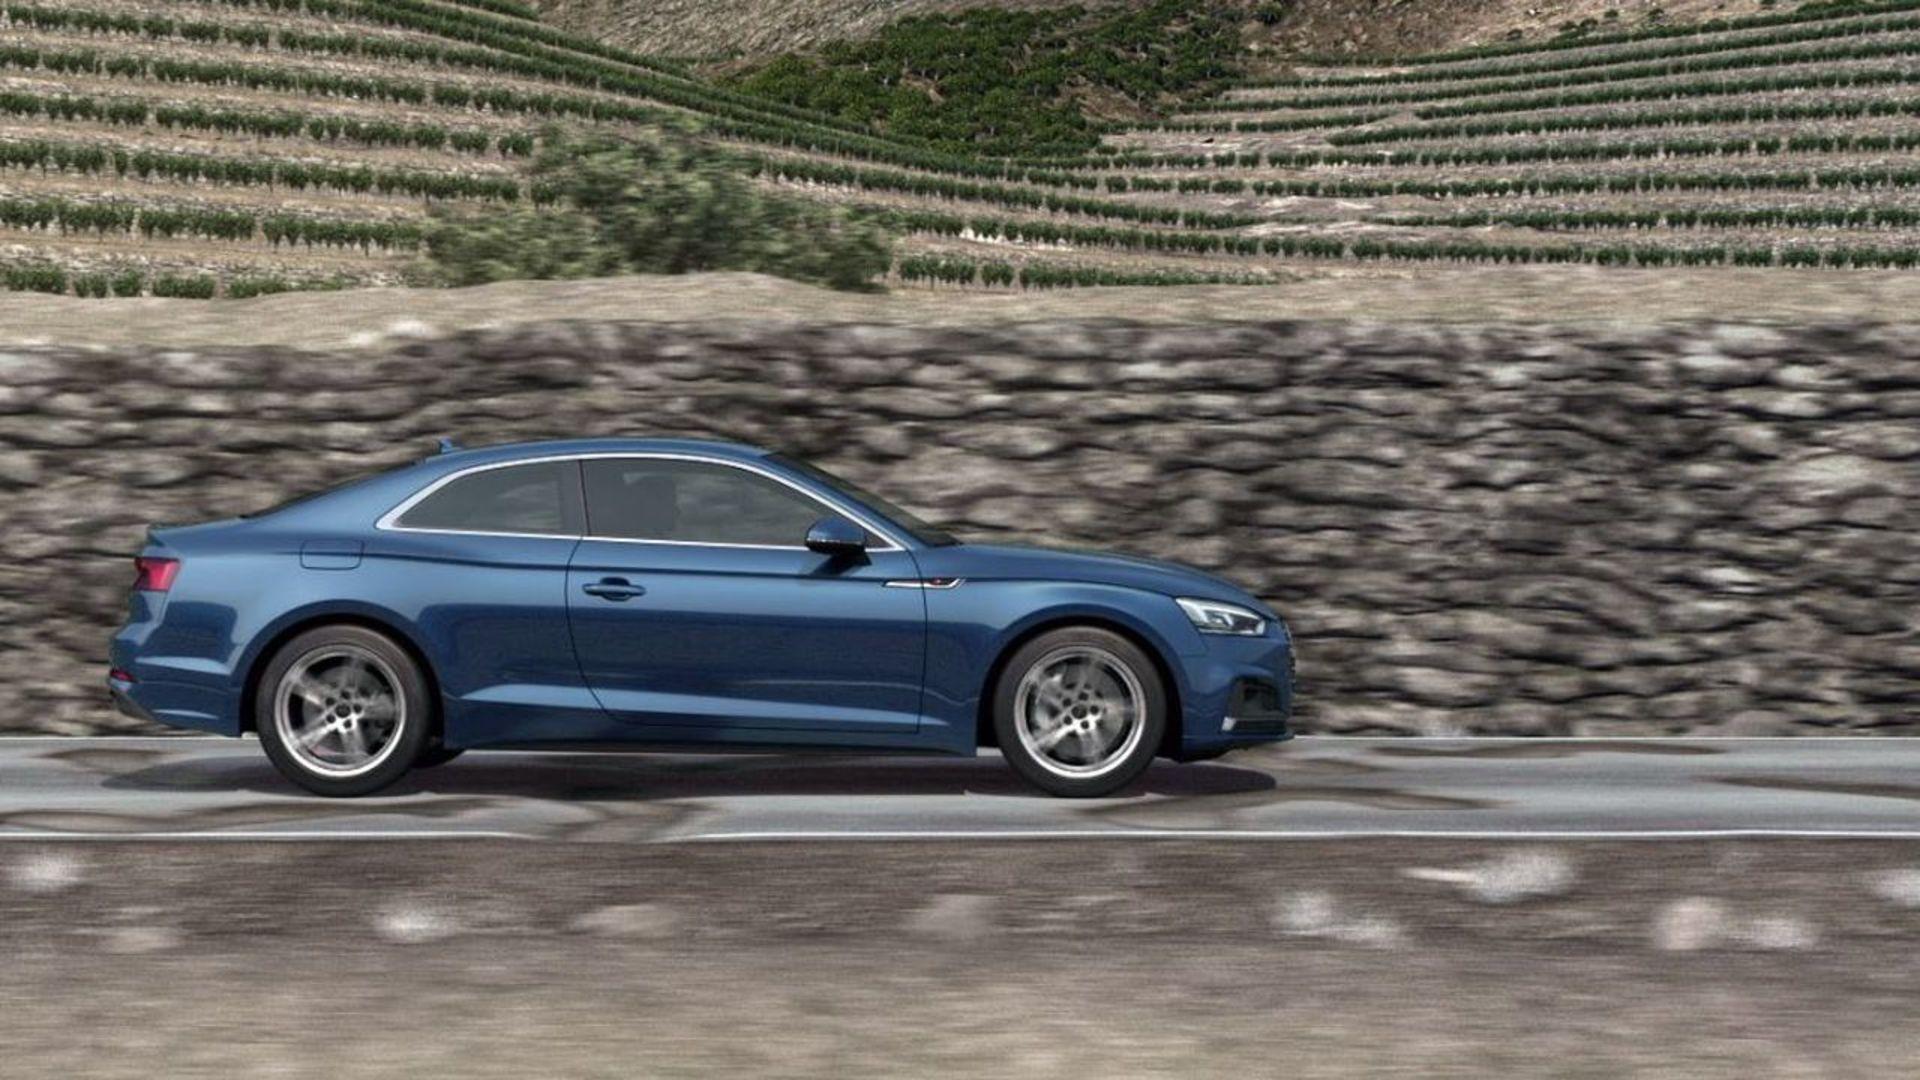 Audi A5 Coupé – Animation Fahrwerk mit Dämpferregelung